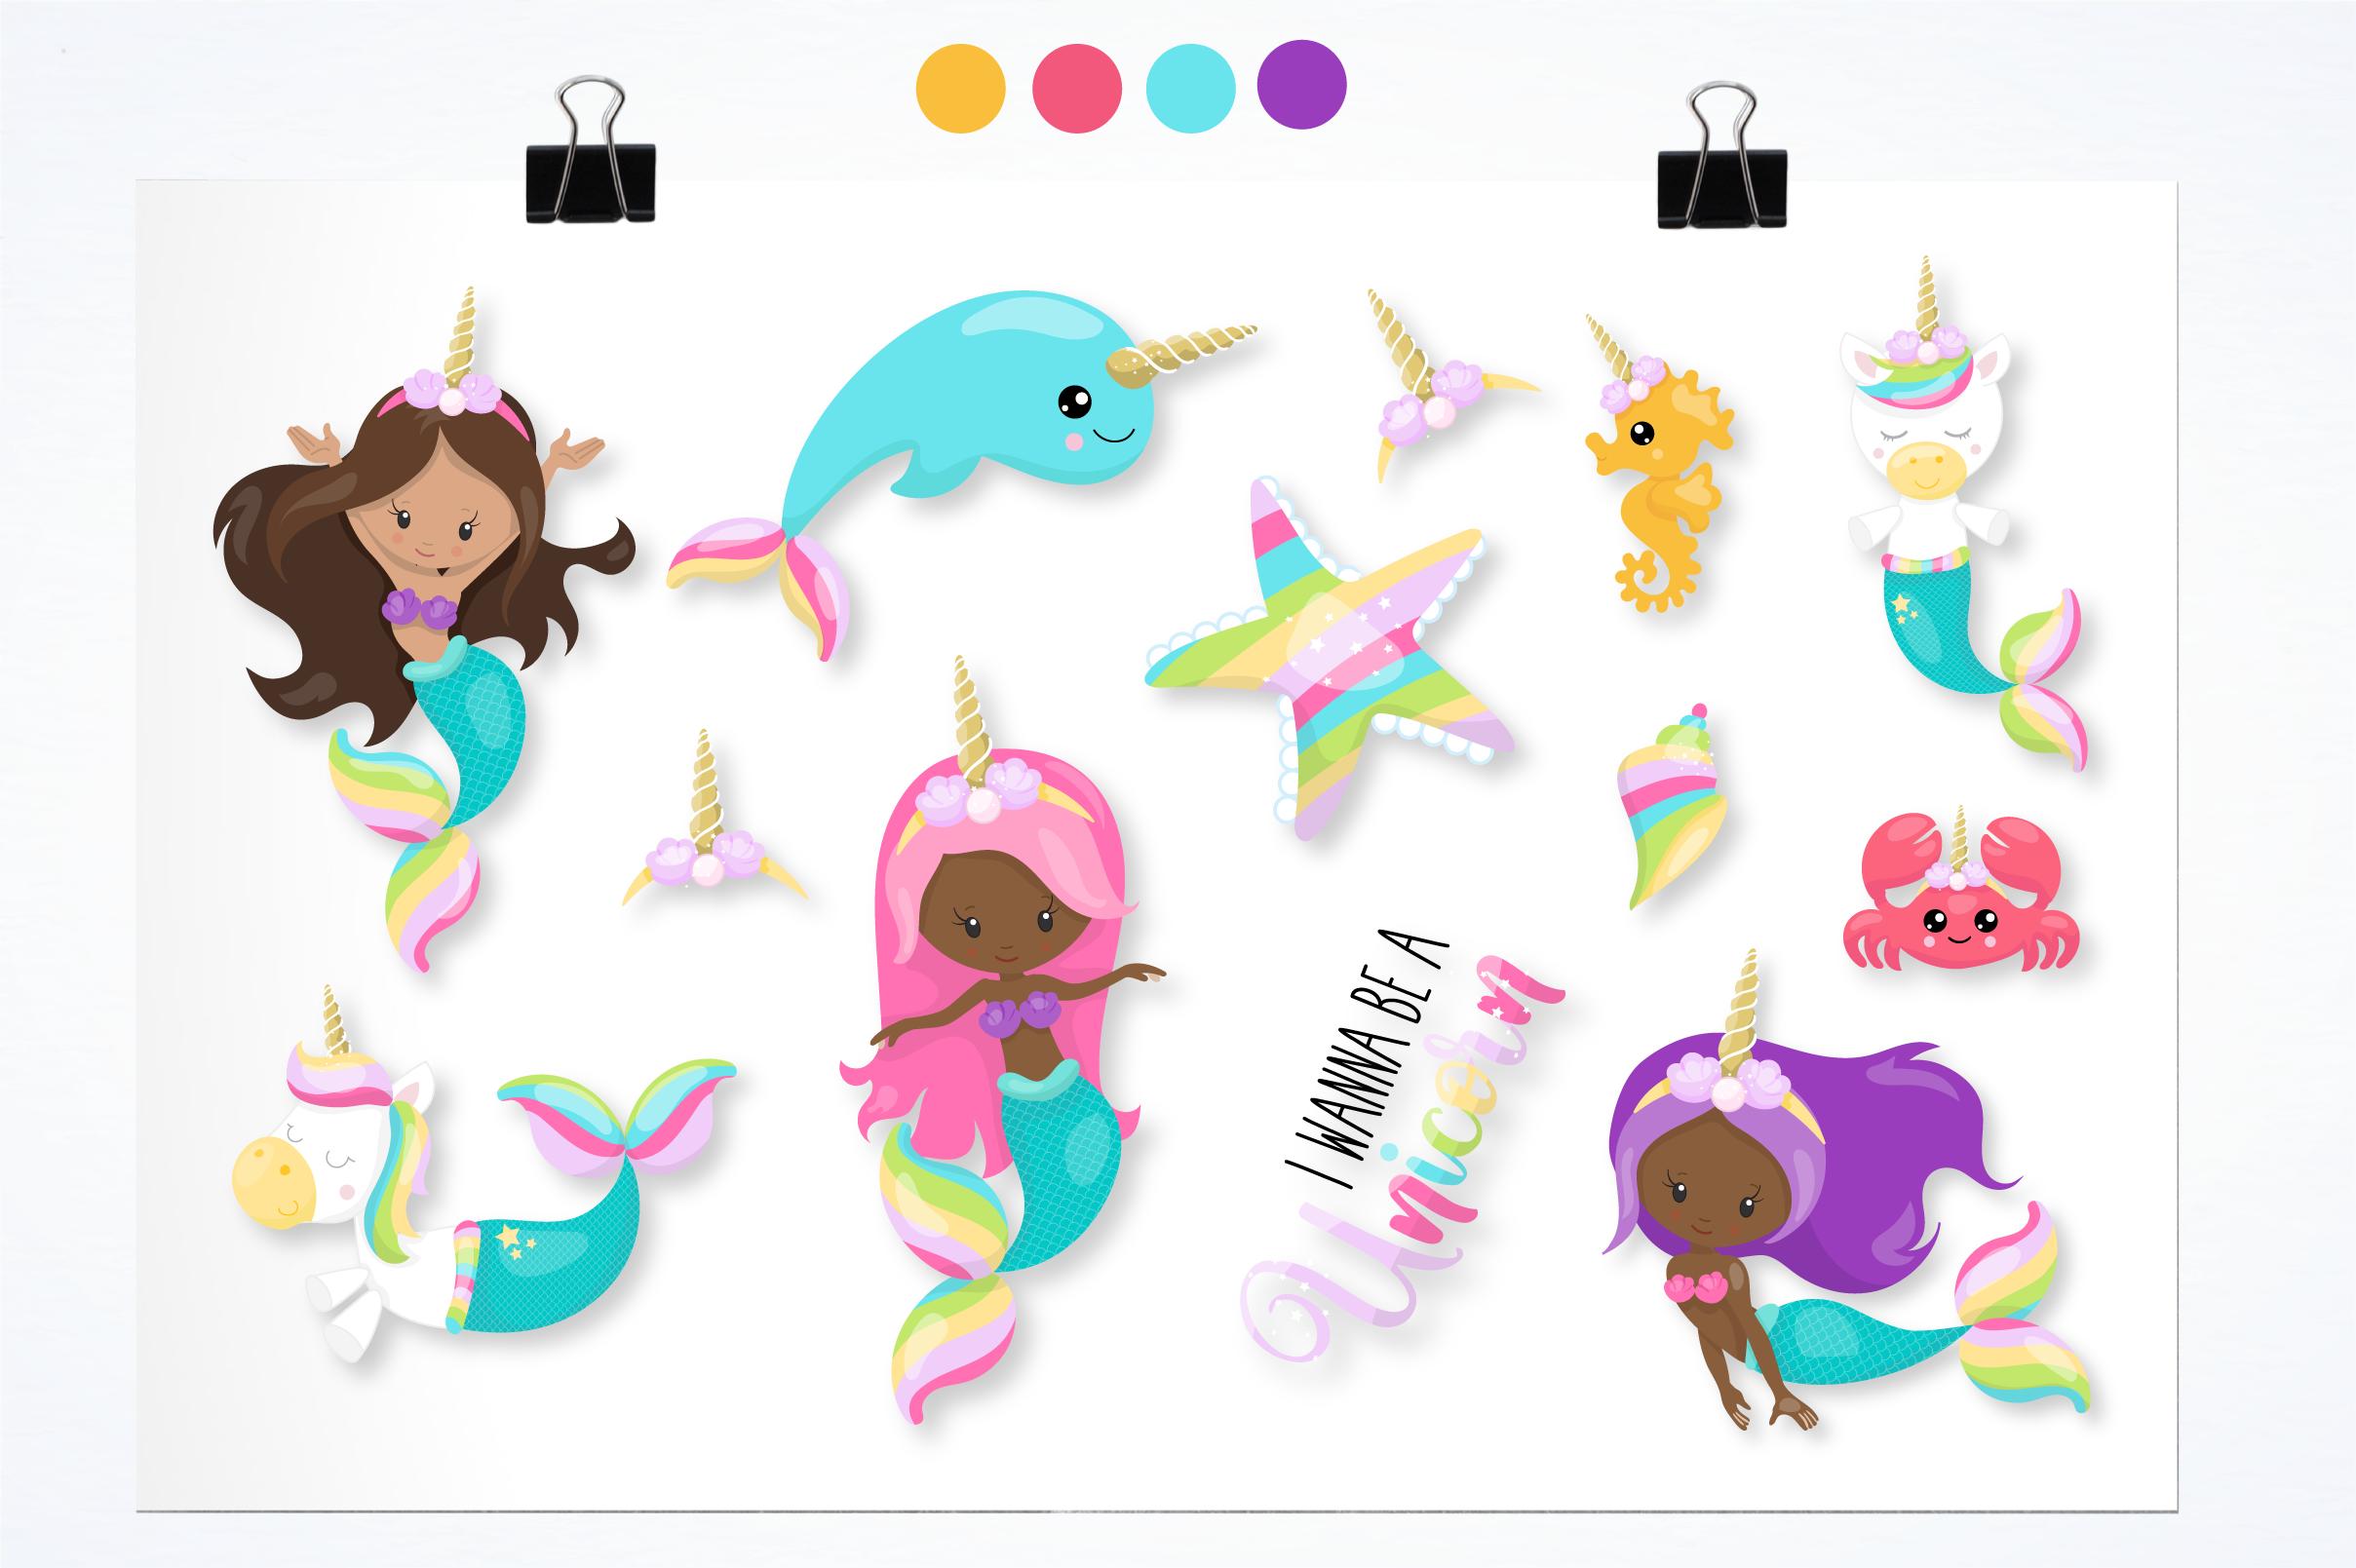 unicorn mermaid graphics and illustrations example image 3